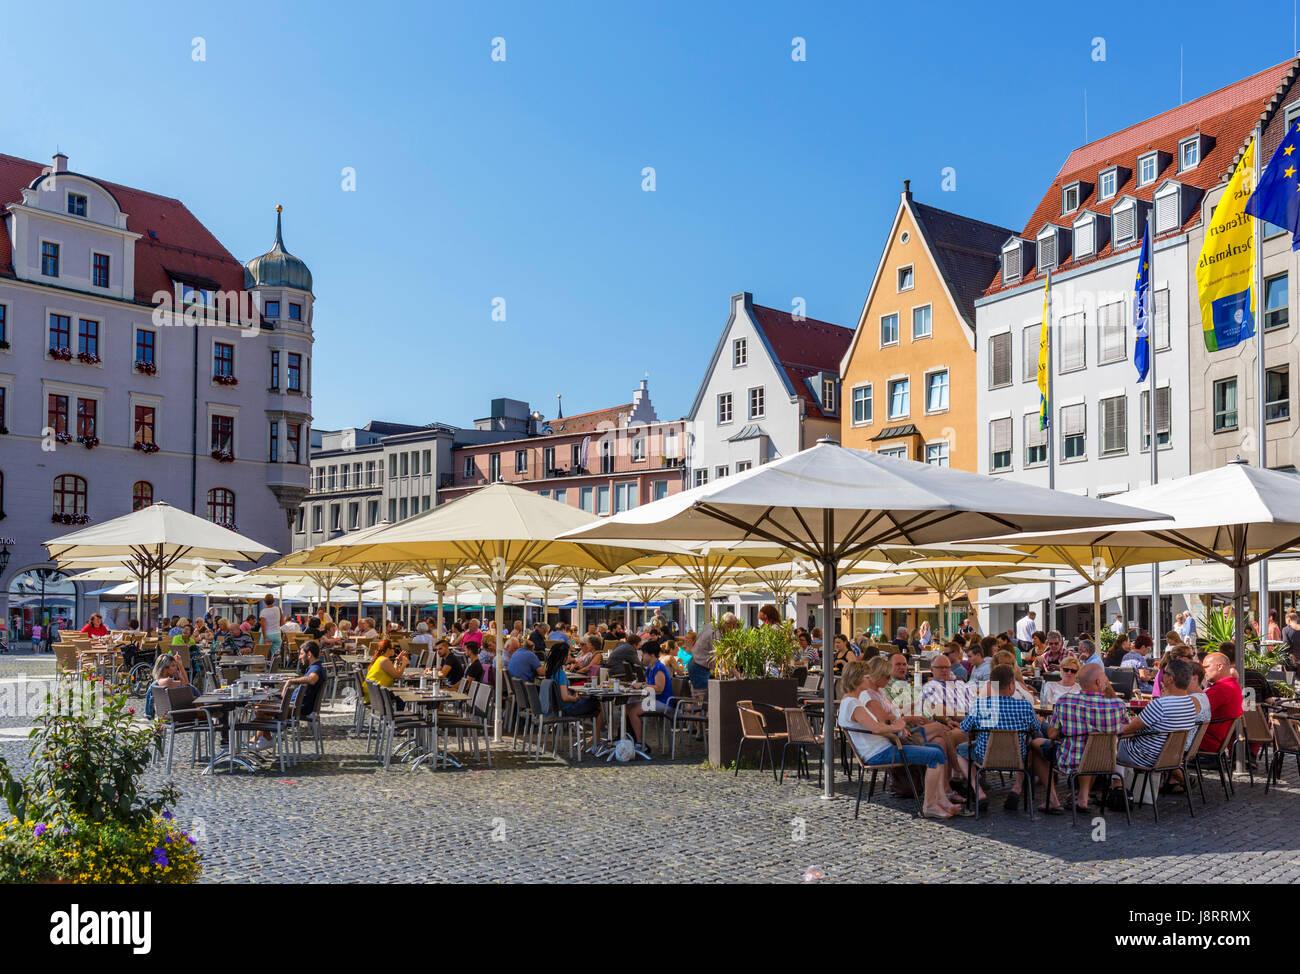 Sidewalk cafe in Rathausplatz, Augsburg, Bavaria, Germany - Stock Image